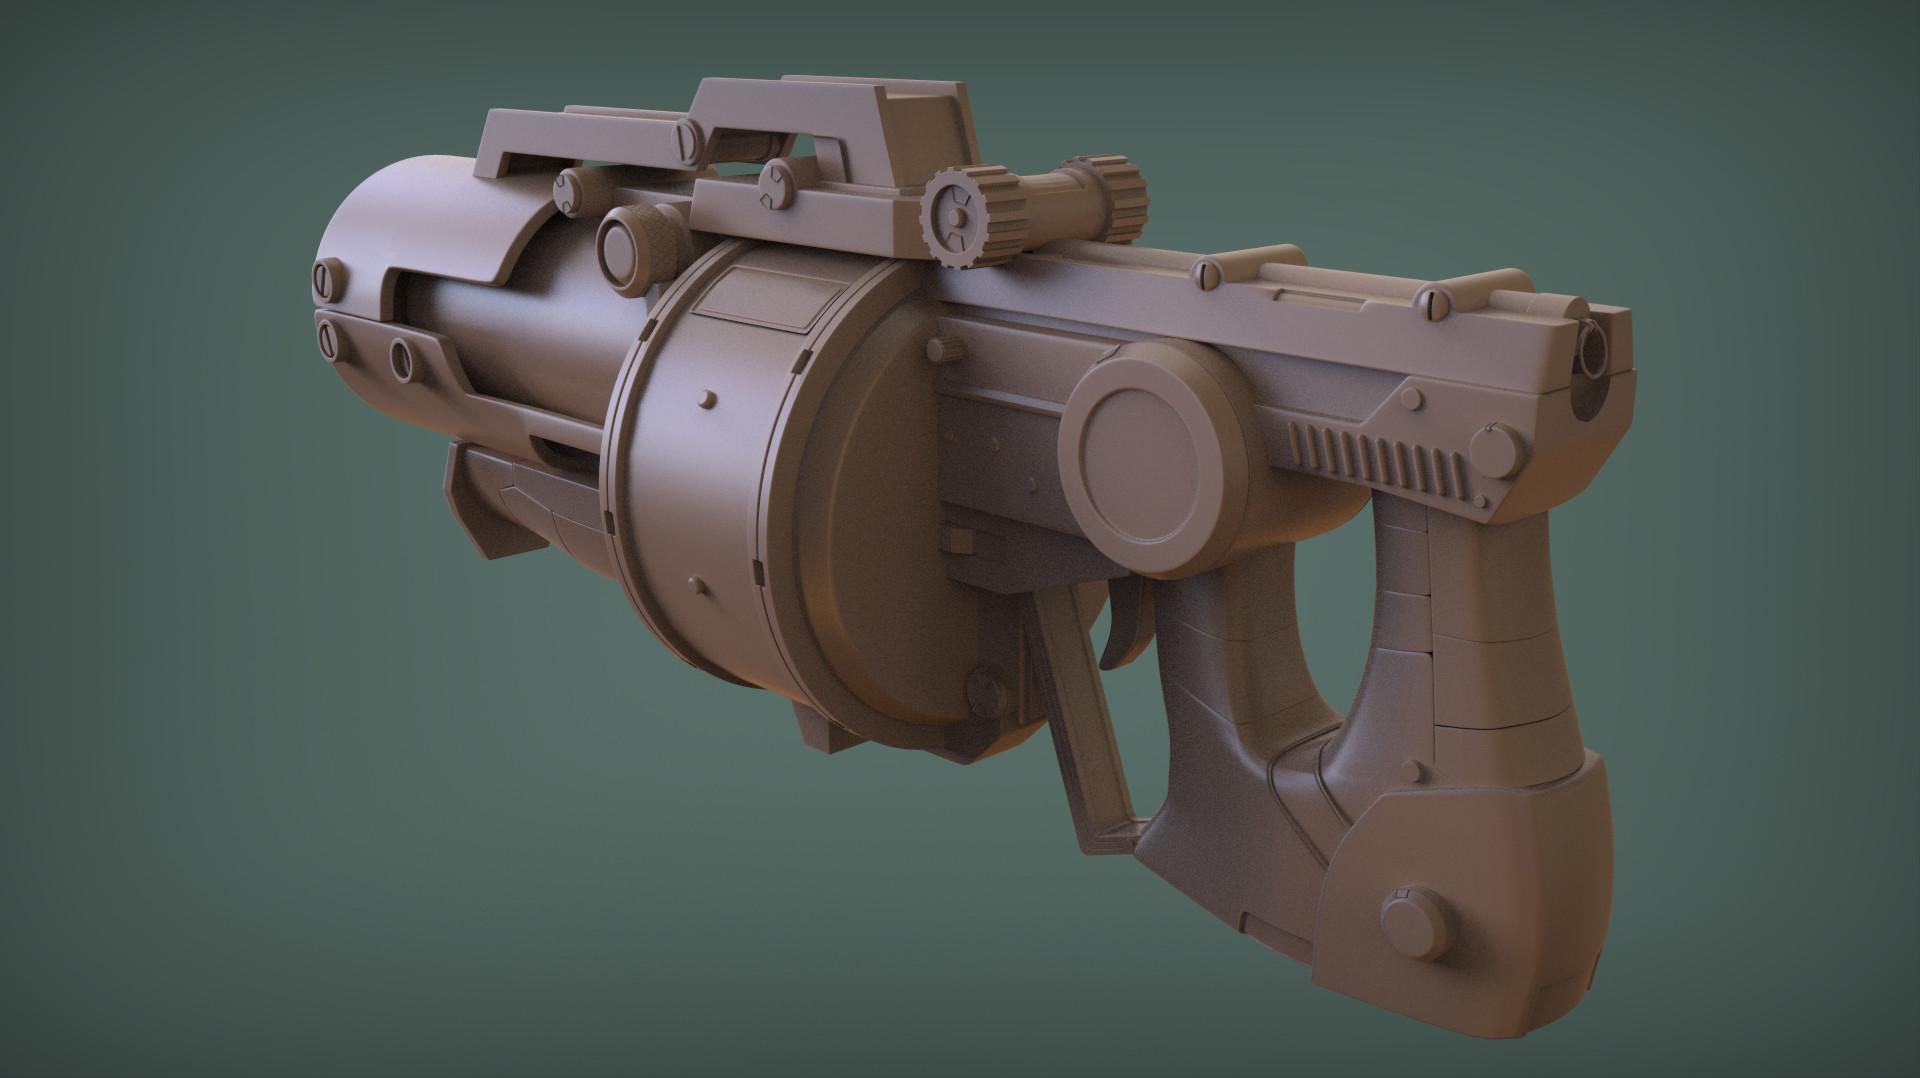 Alexander gonzalez alexander gonzalez gun 002 4